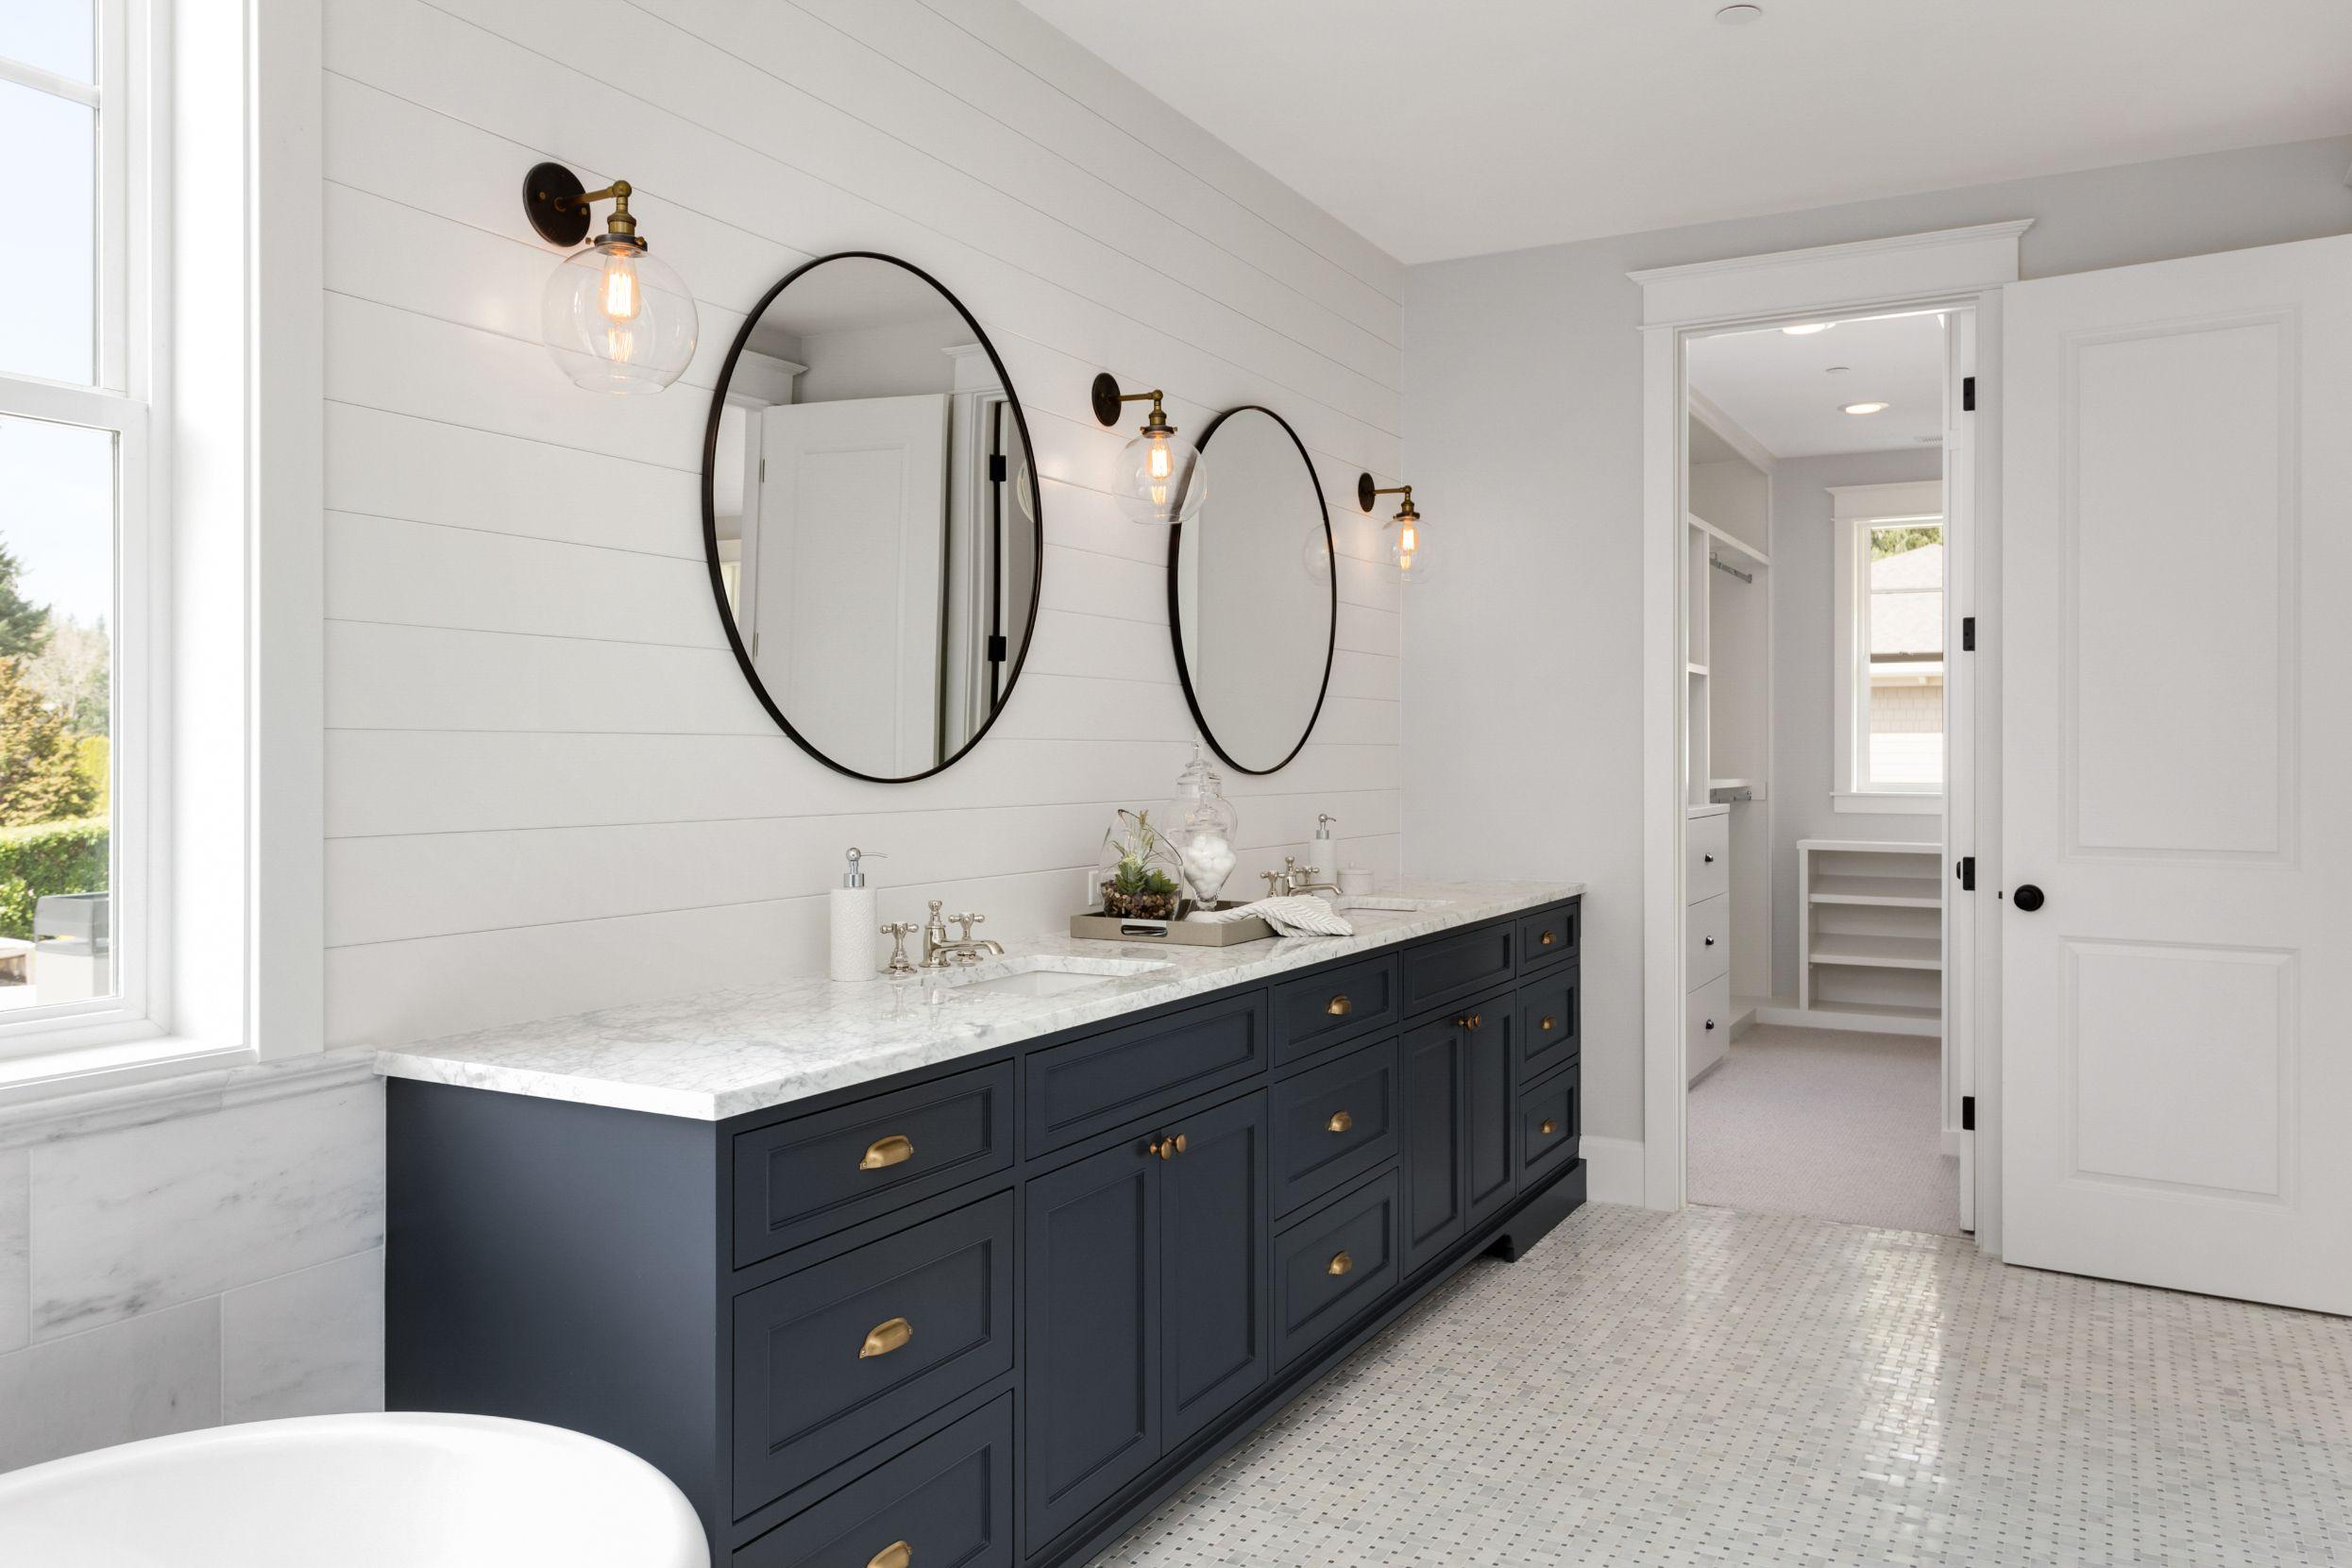 Cost Of Pre Made Vs Custom Built Bathroom Vanities Comparison